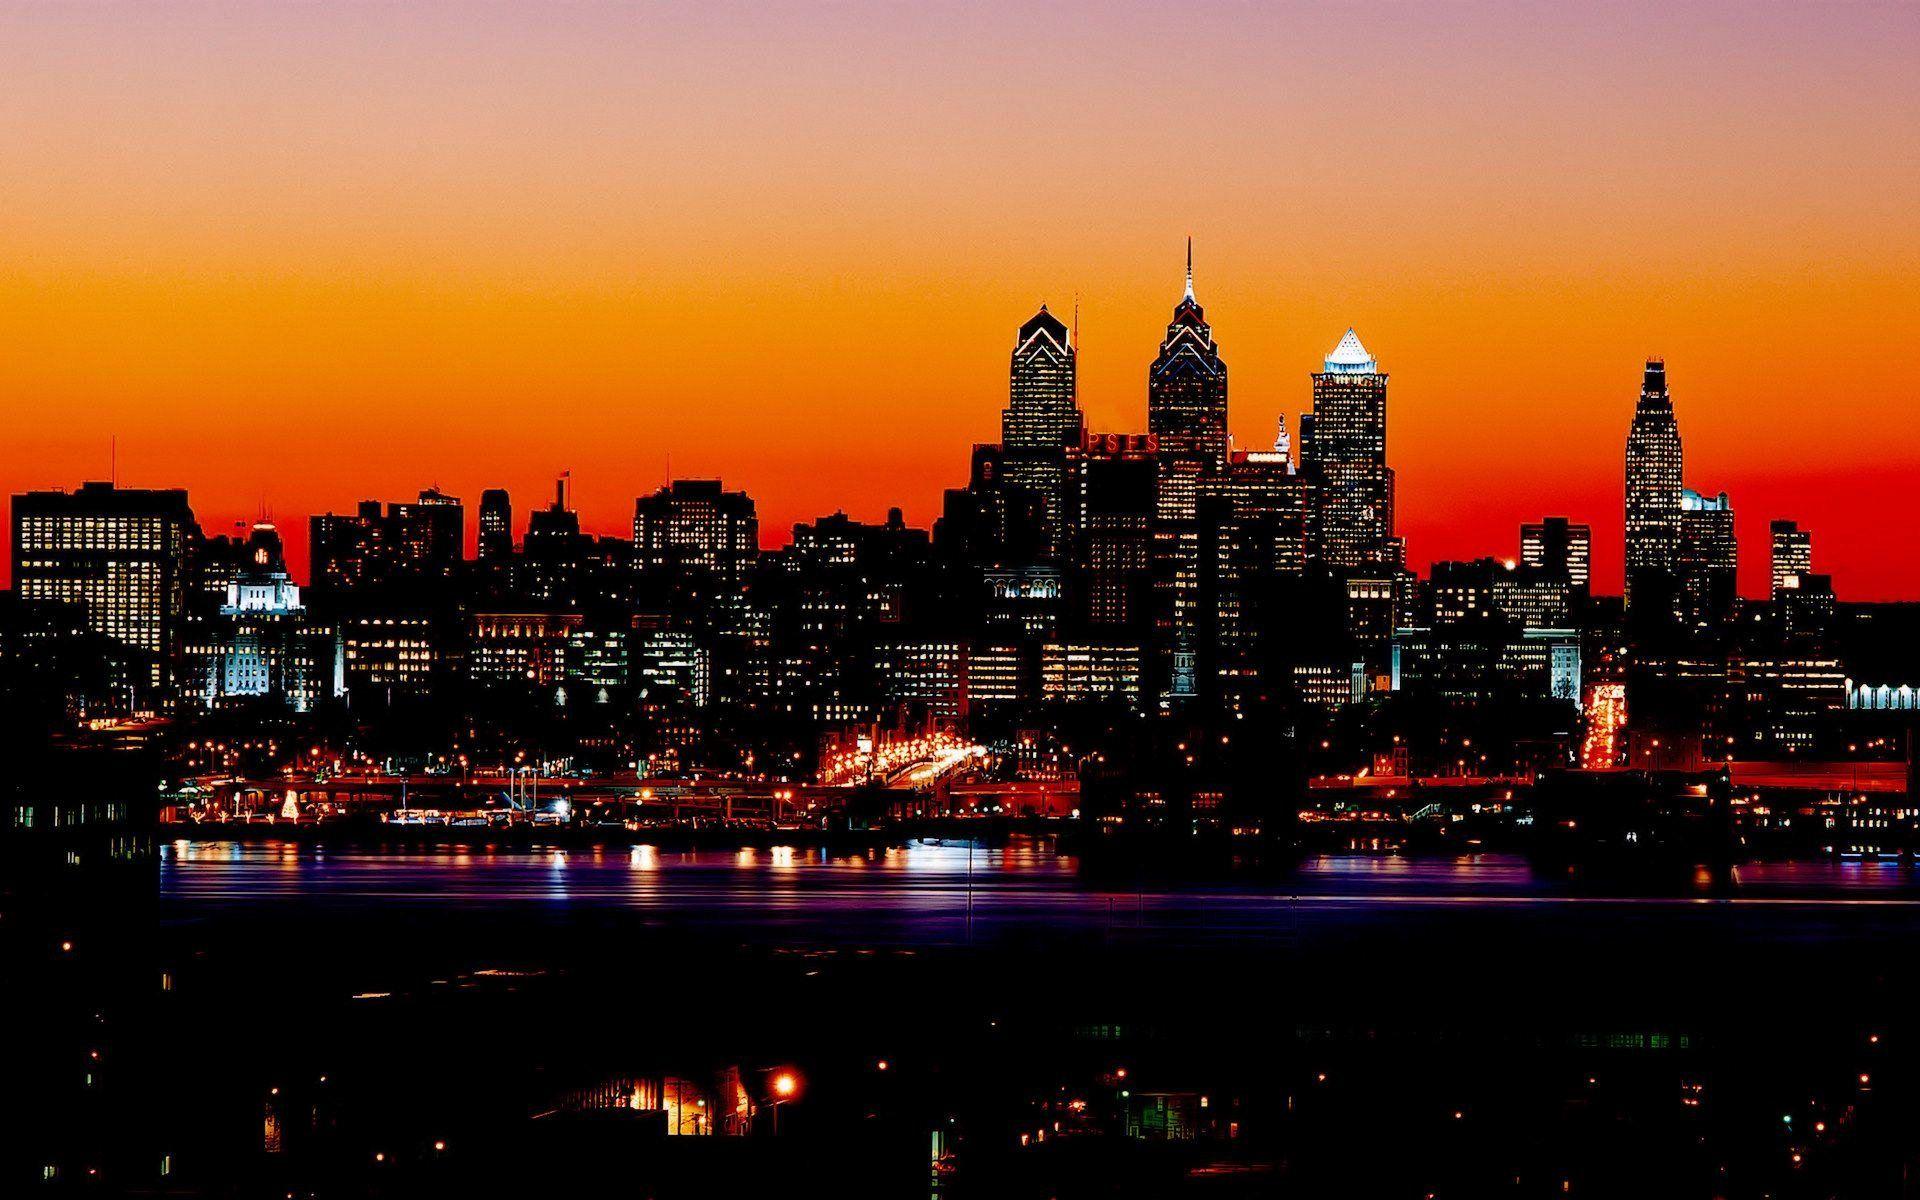 Night City Lights Hd Wallpaper   architecture/nature in 2019   City lights at night, City lights ...